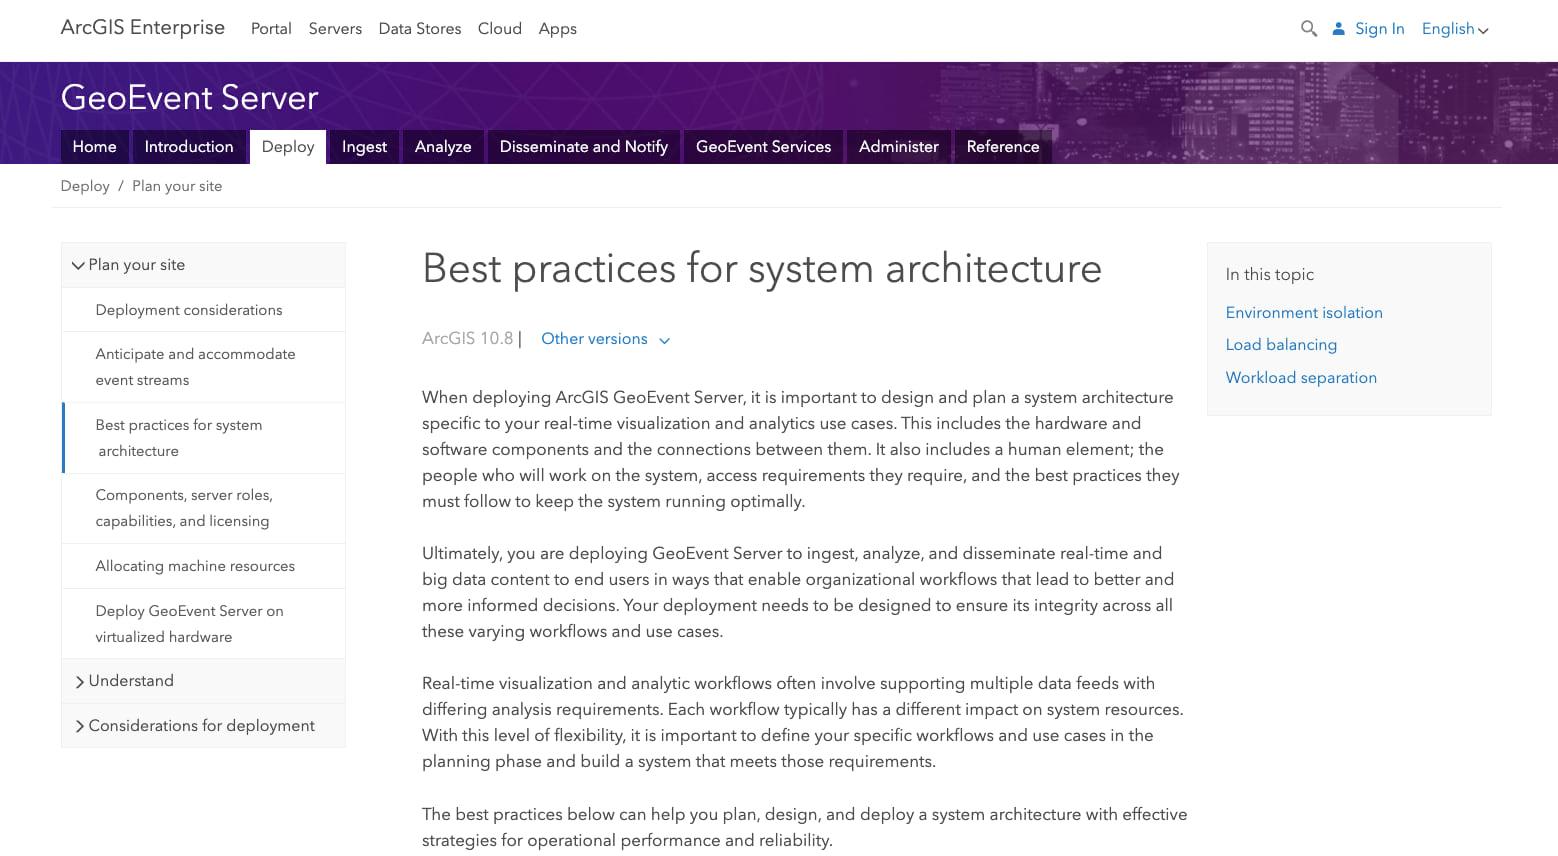 ArcGIS GeoEvent Server documentation page